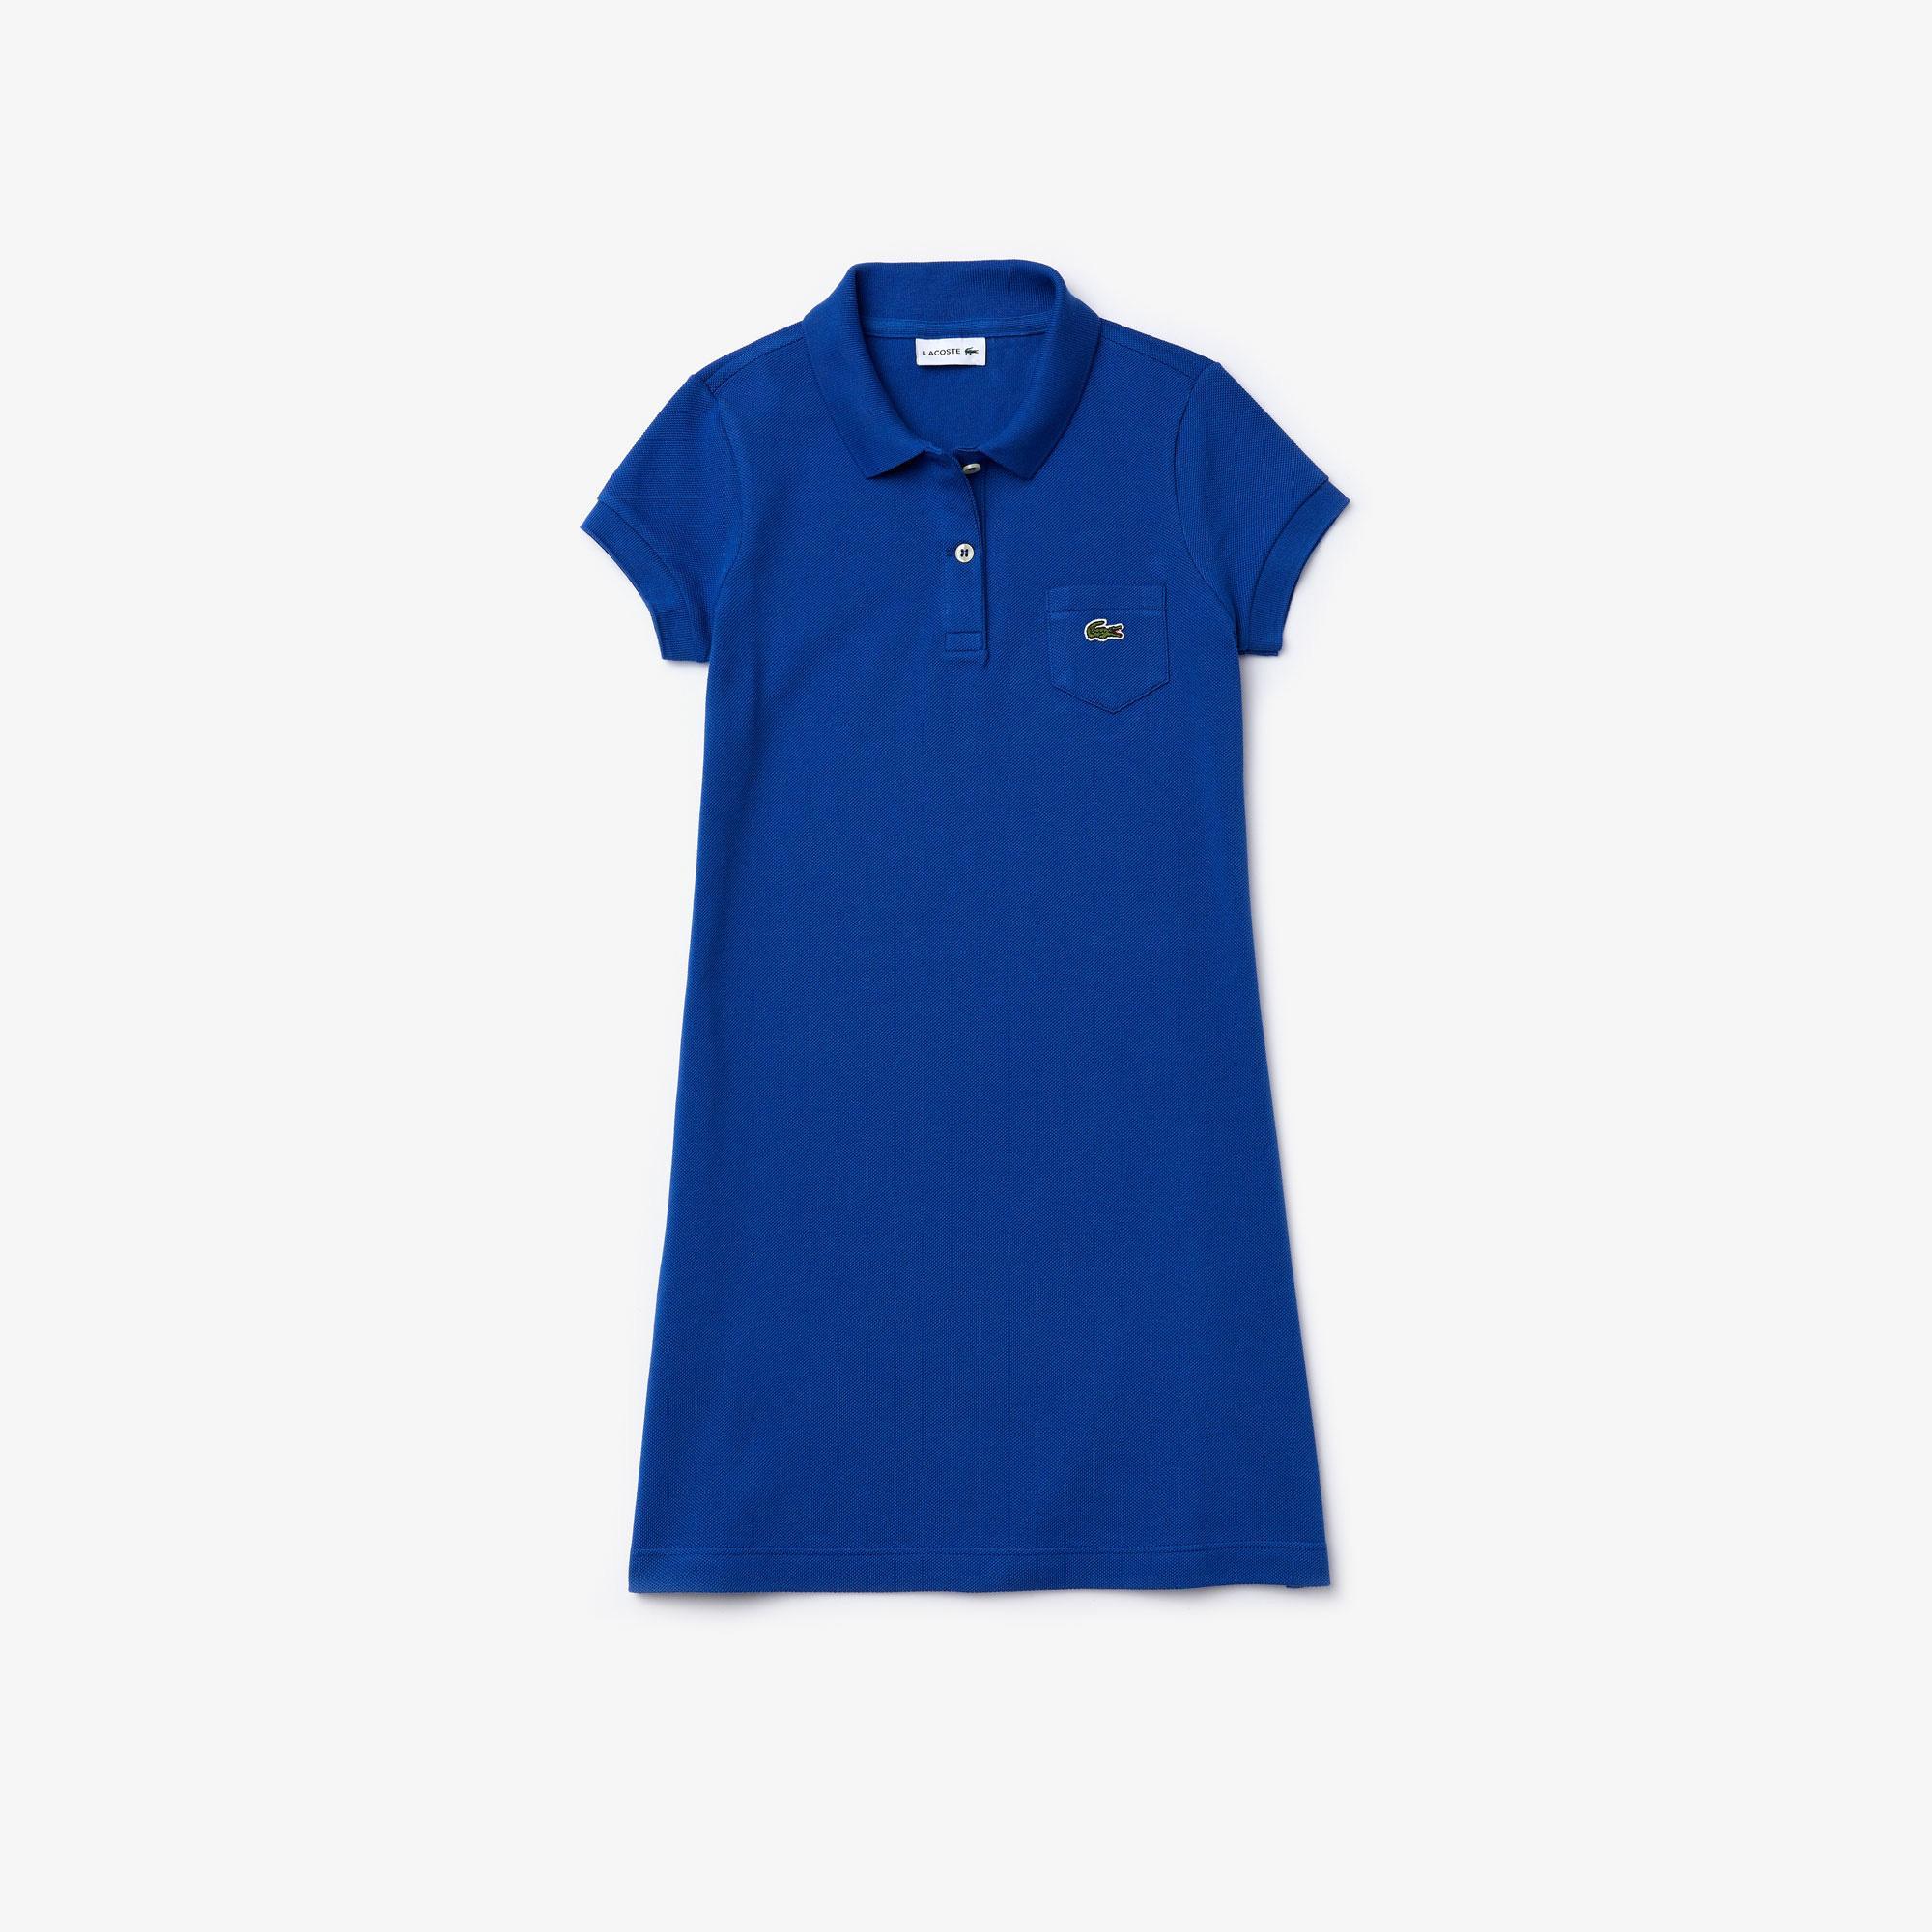 Lacoste Çocuk Saks Mavi Polo Yaka Elbise